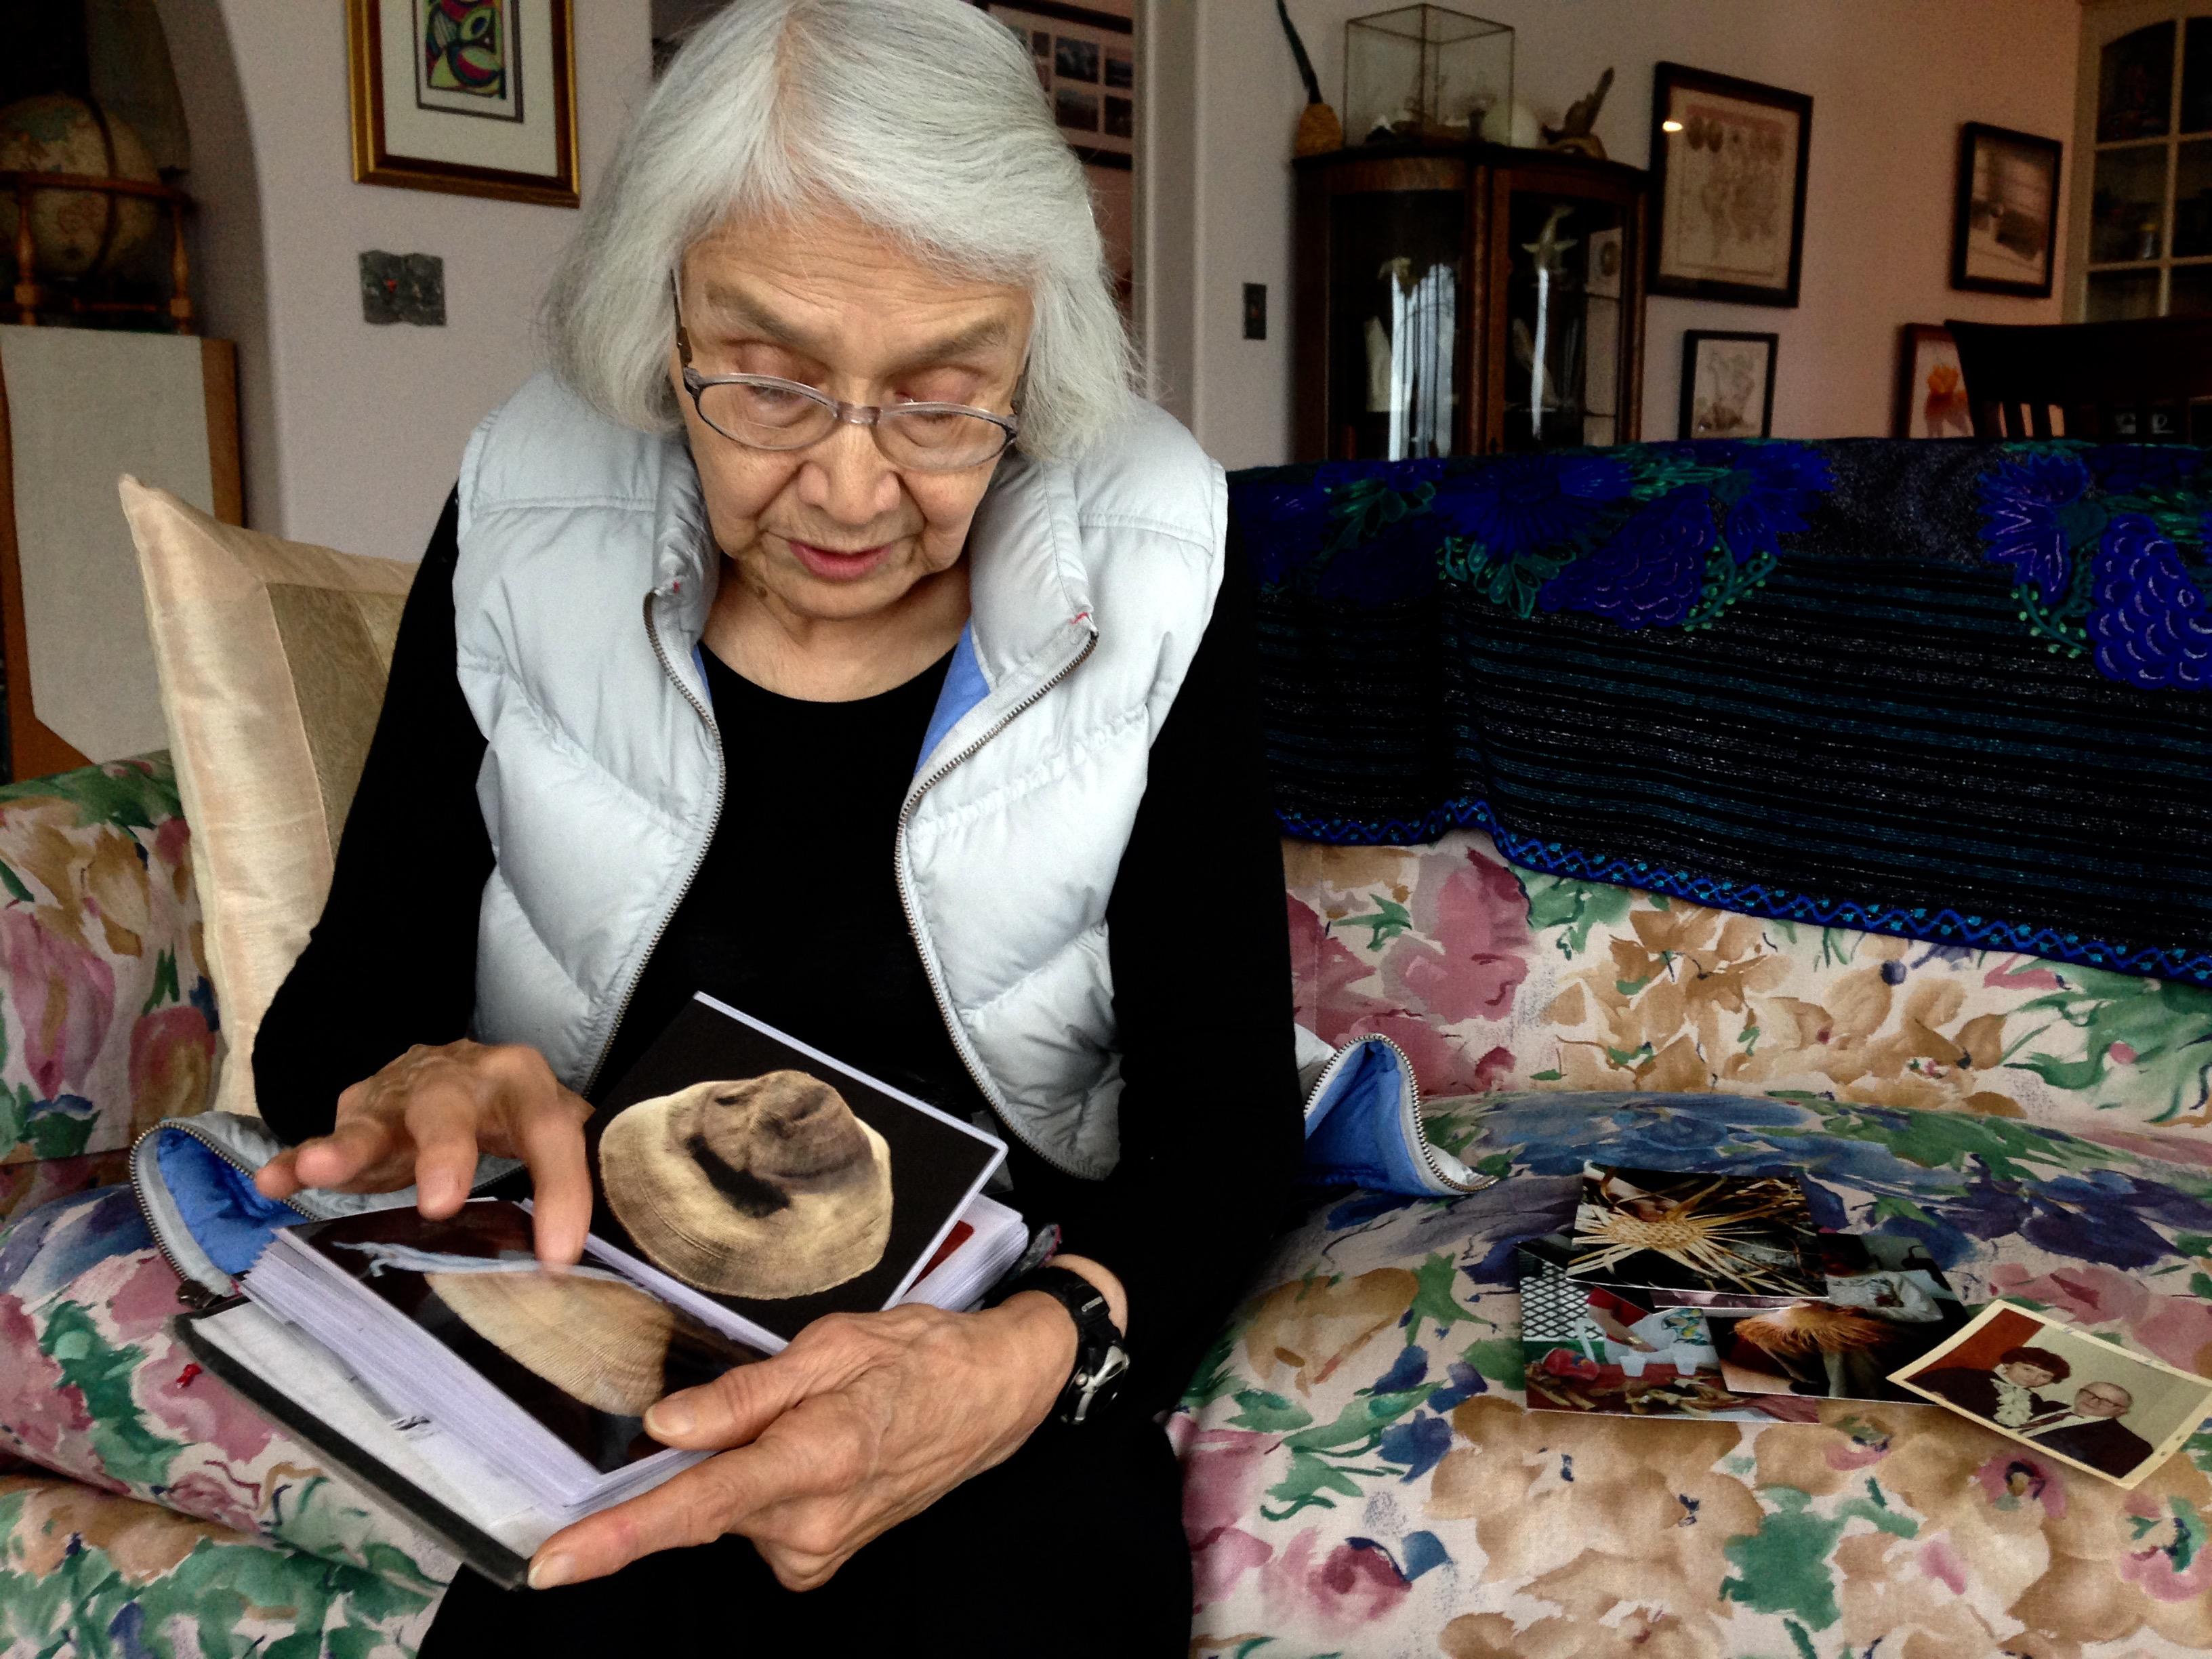 Haida master weaver Delores Churchill shares her story